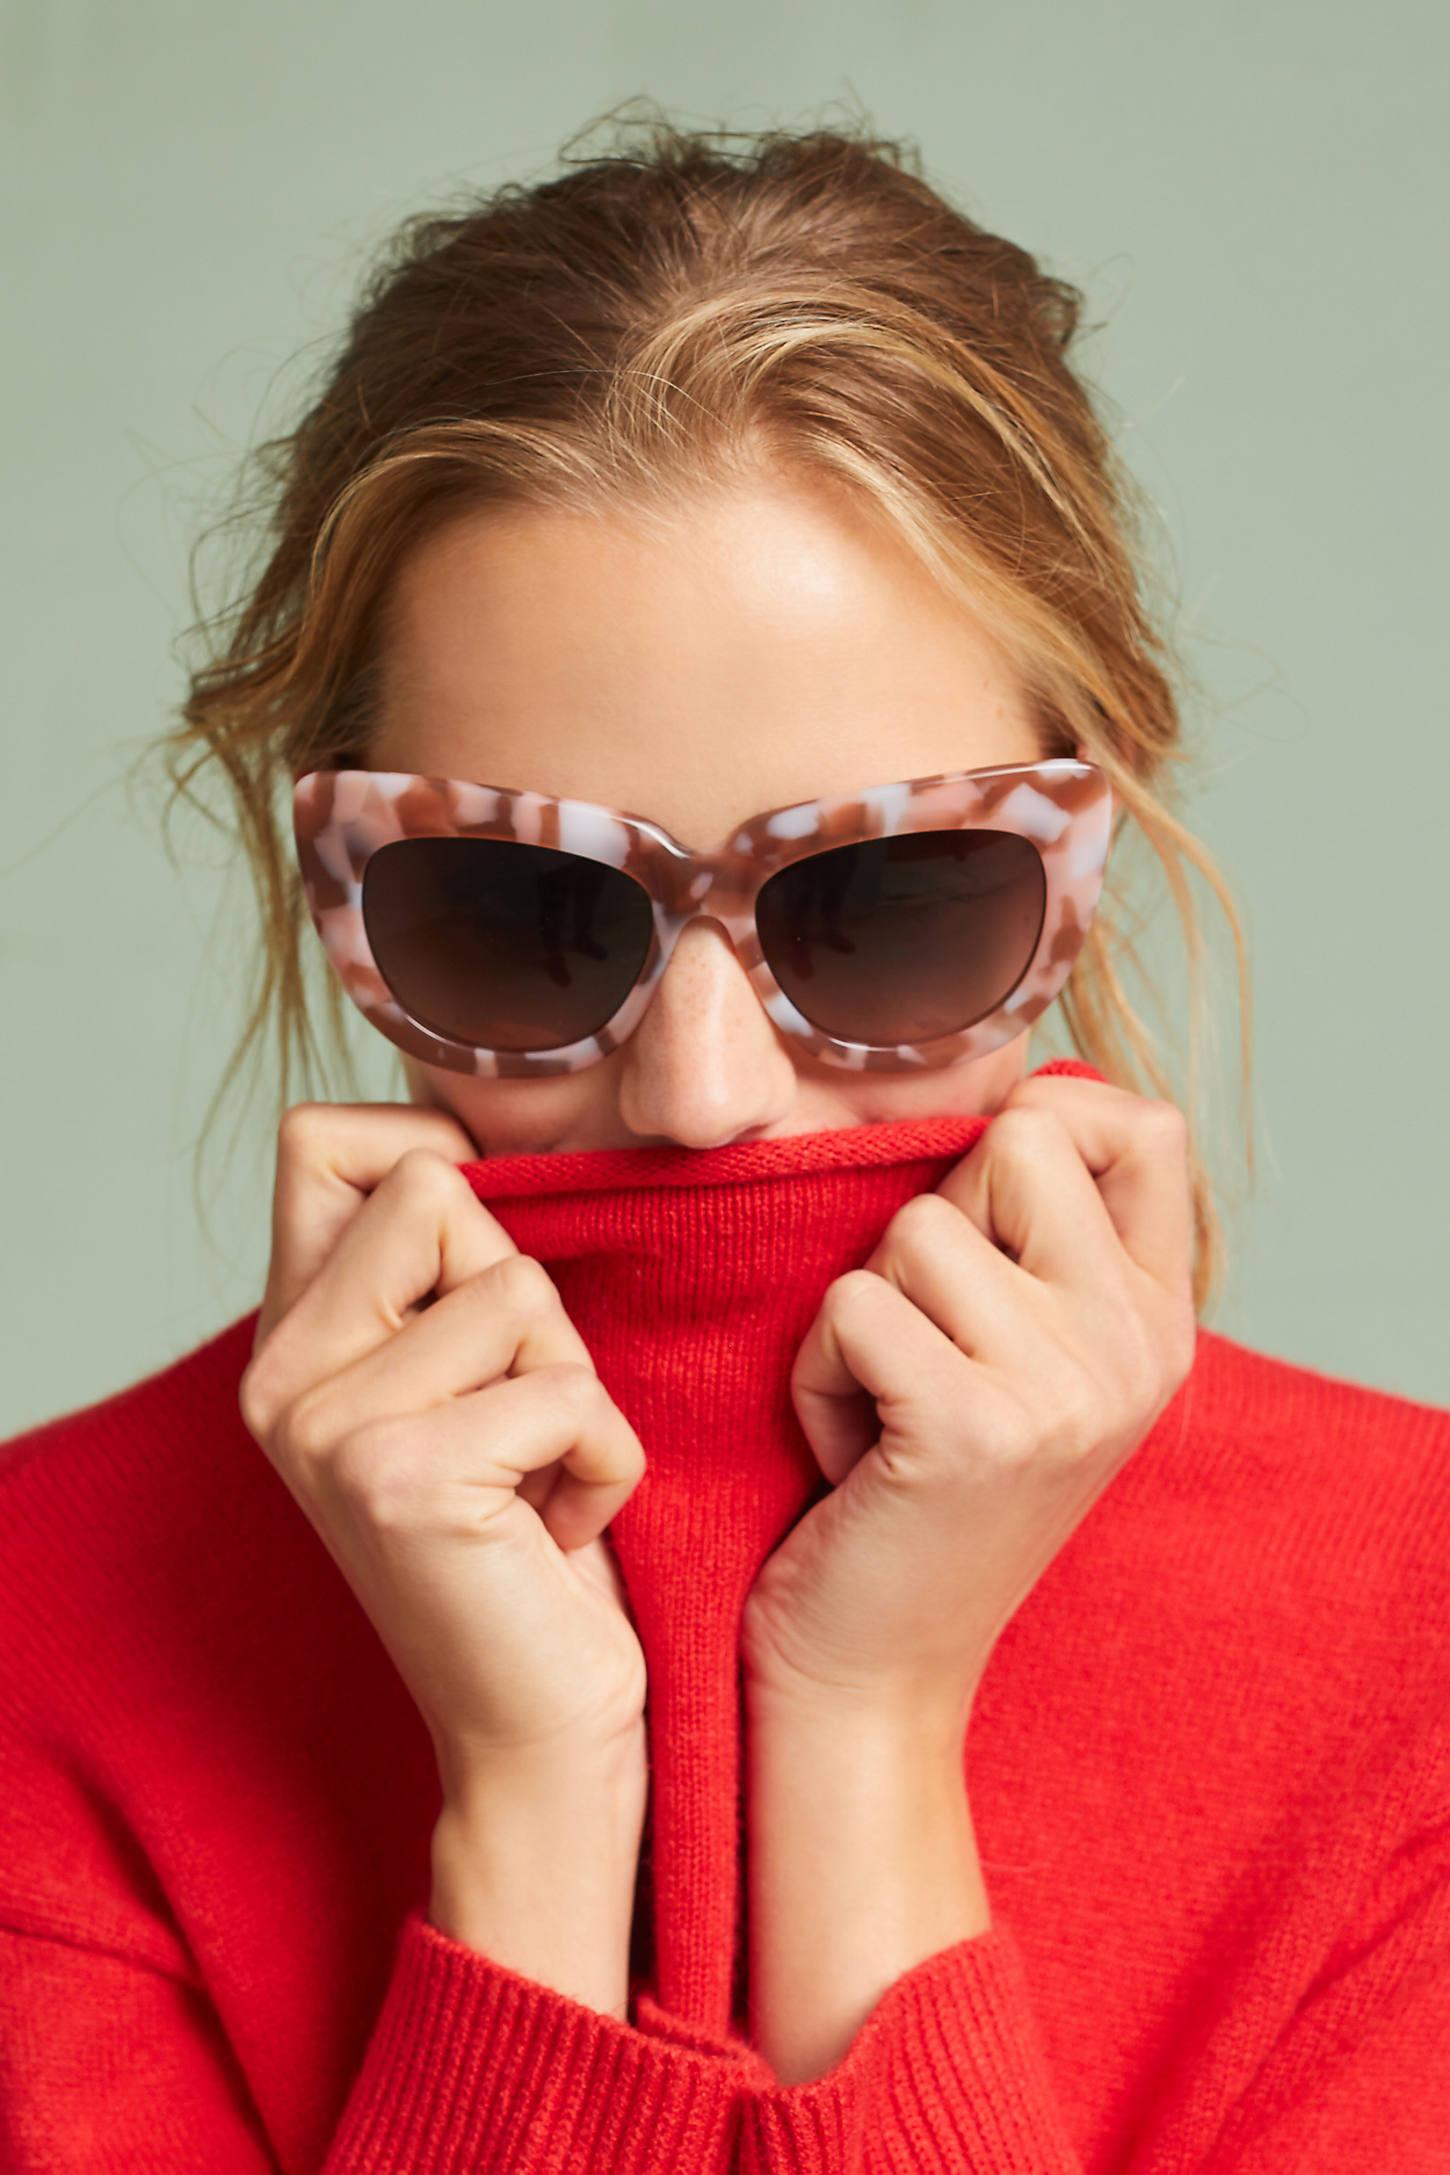 Sonix Coco Cat-Eye Sunglasses